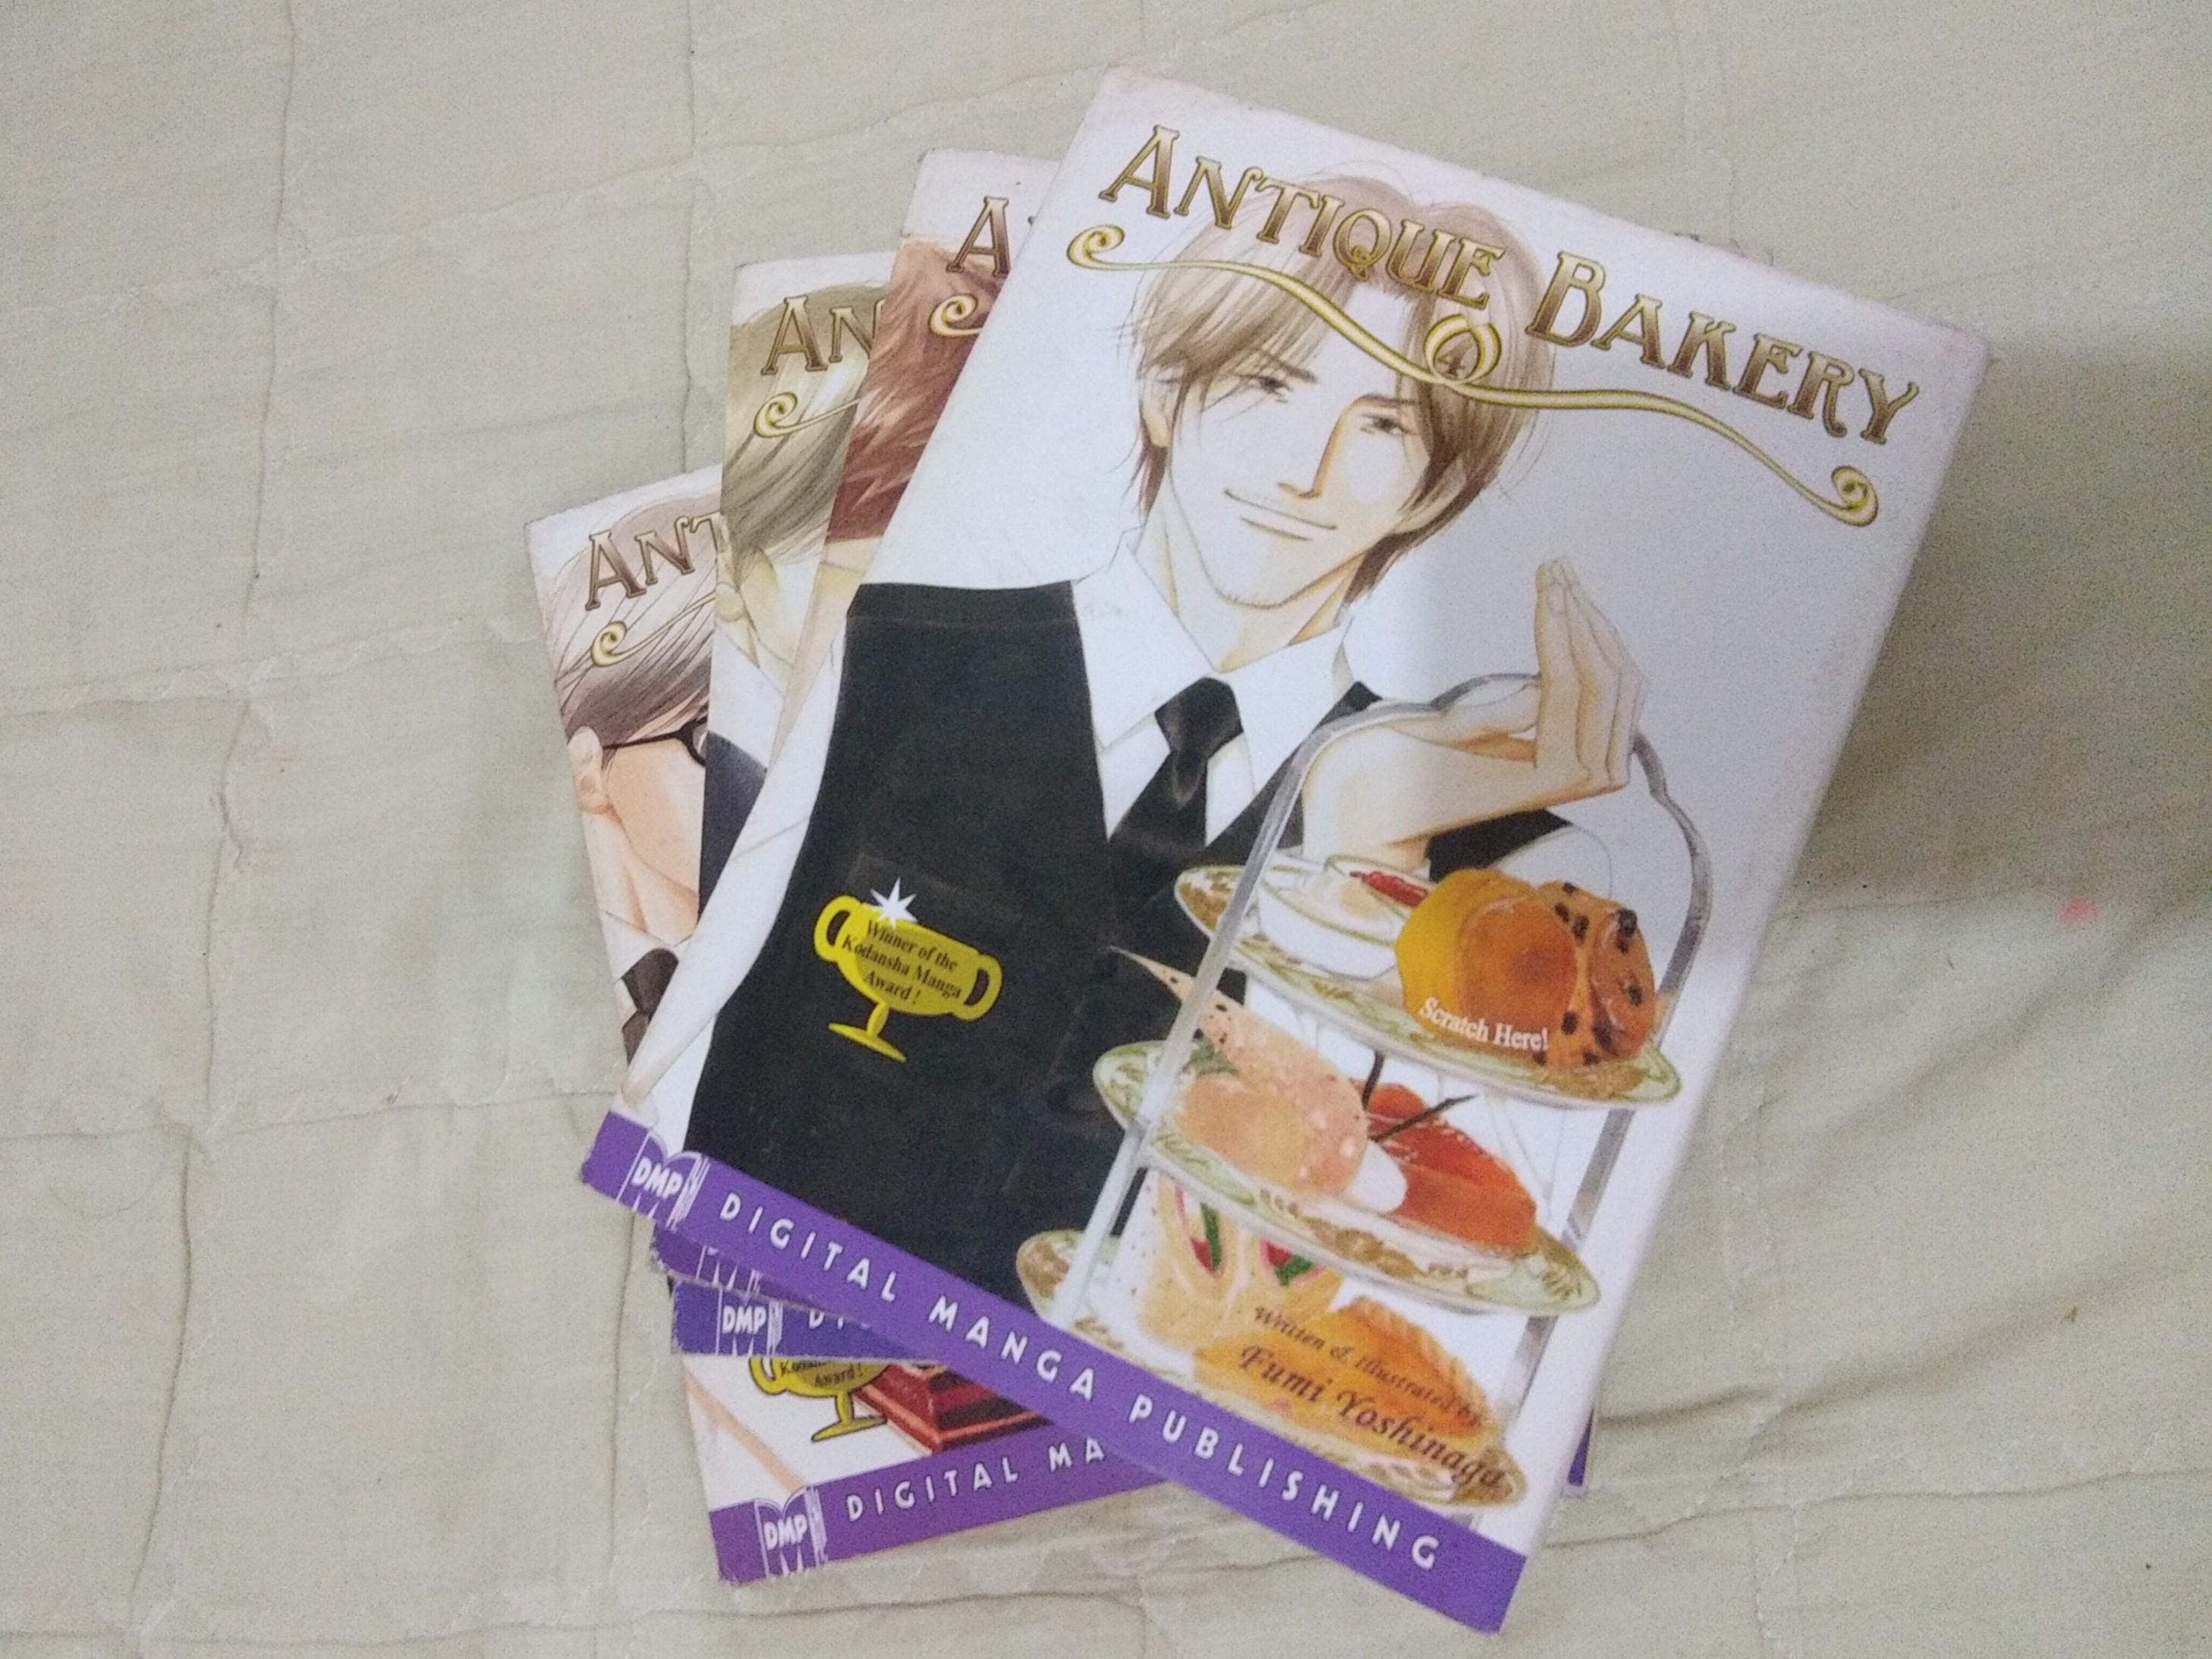 BL Yaoi (Complete set) Antique Bakery manga (Vol. 1-4)